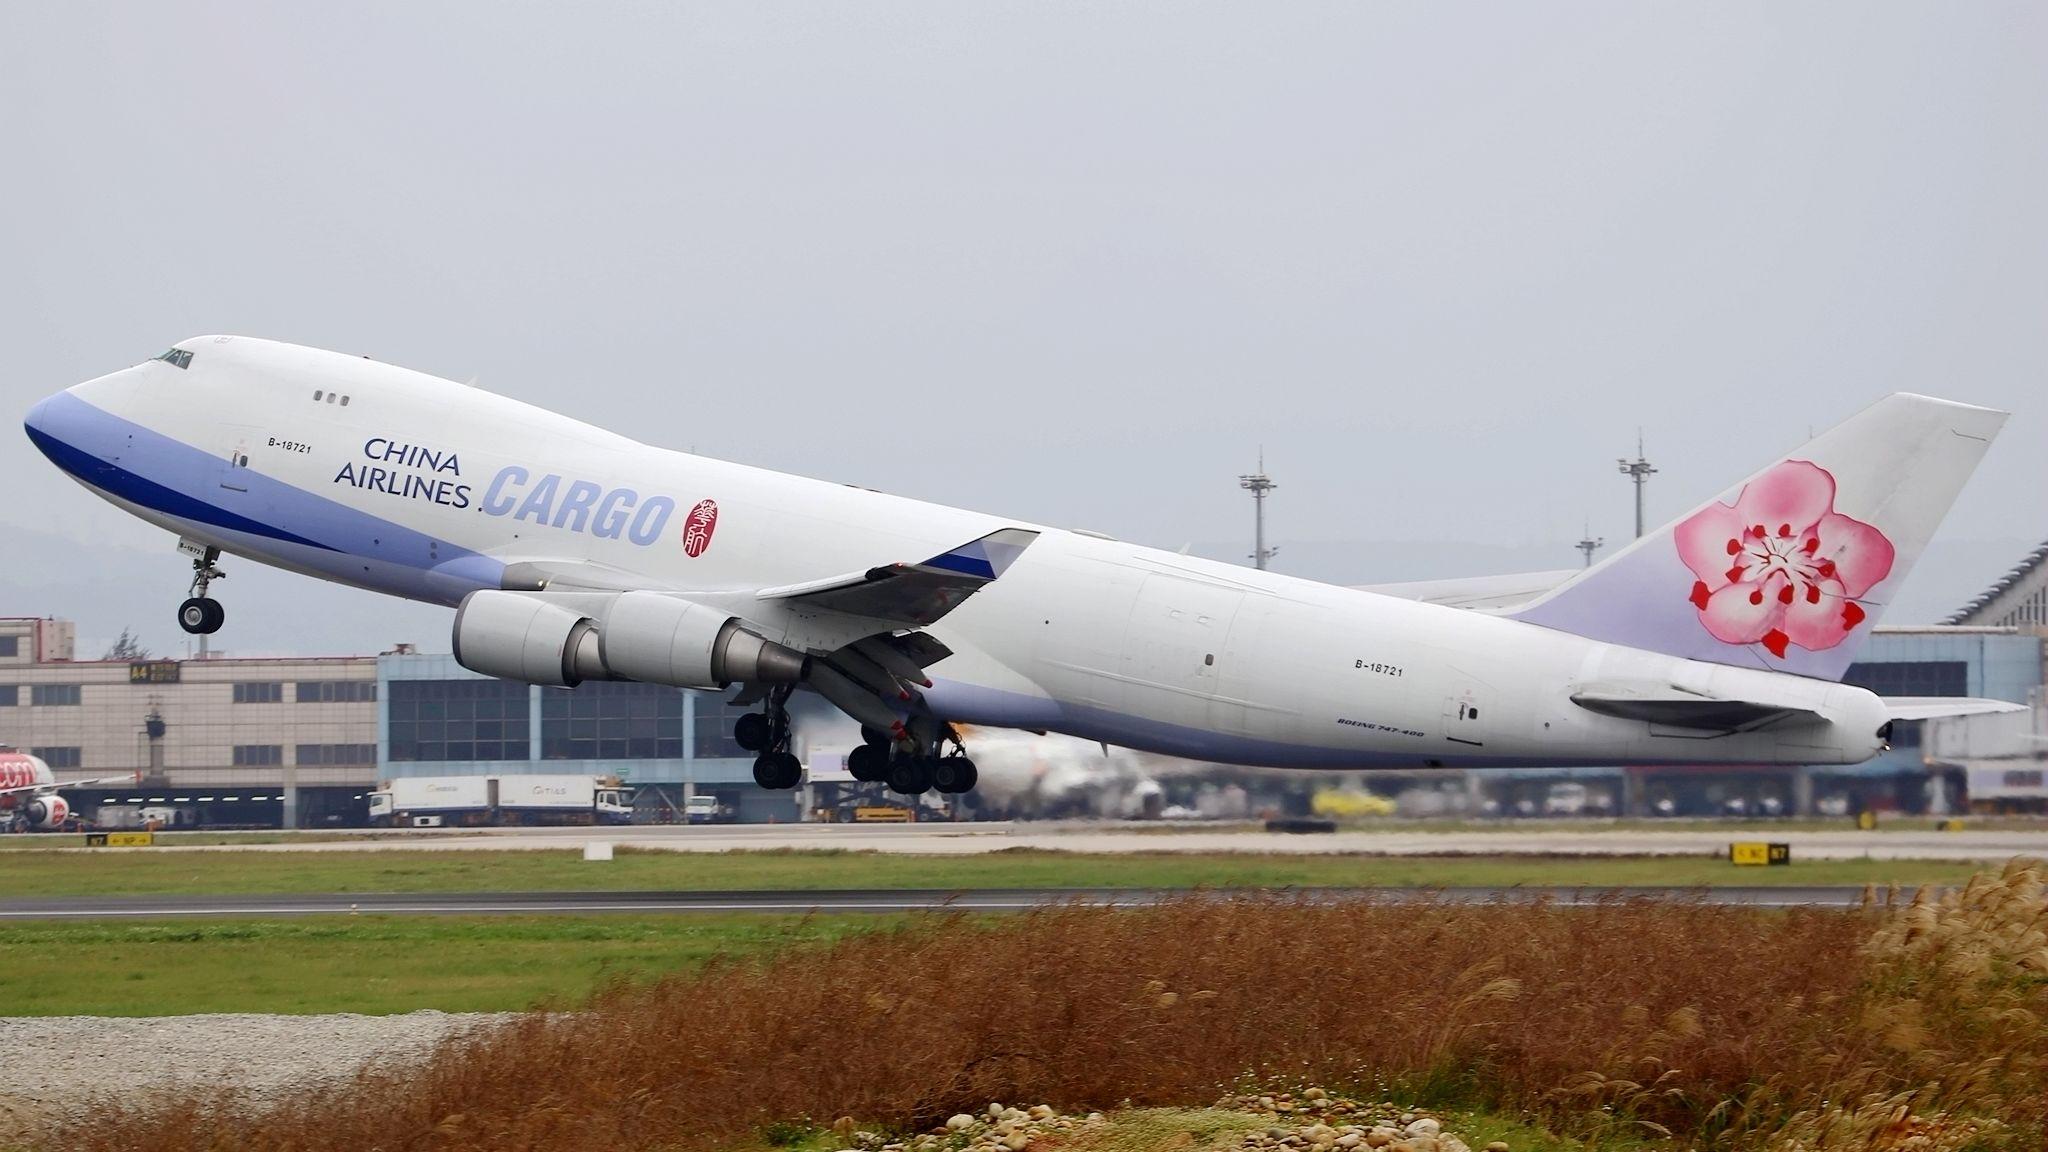 Boeing 747-409F